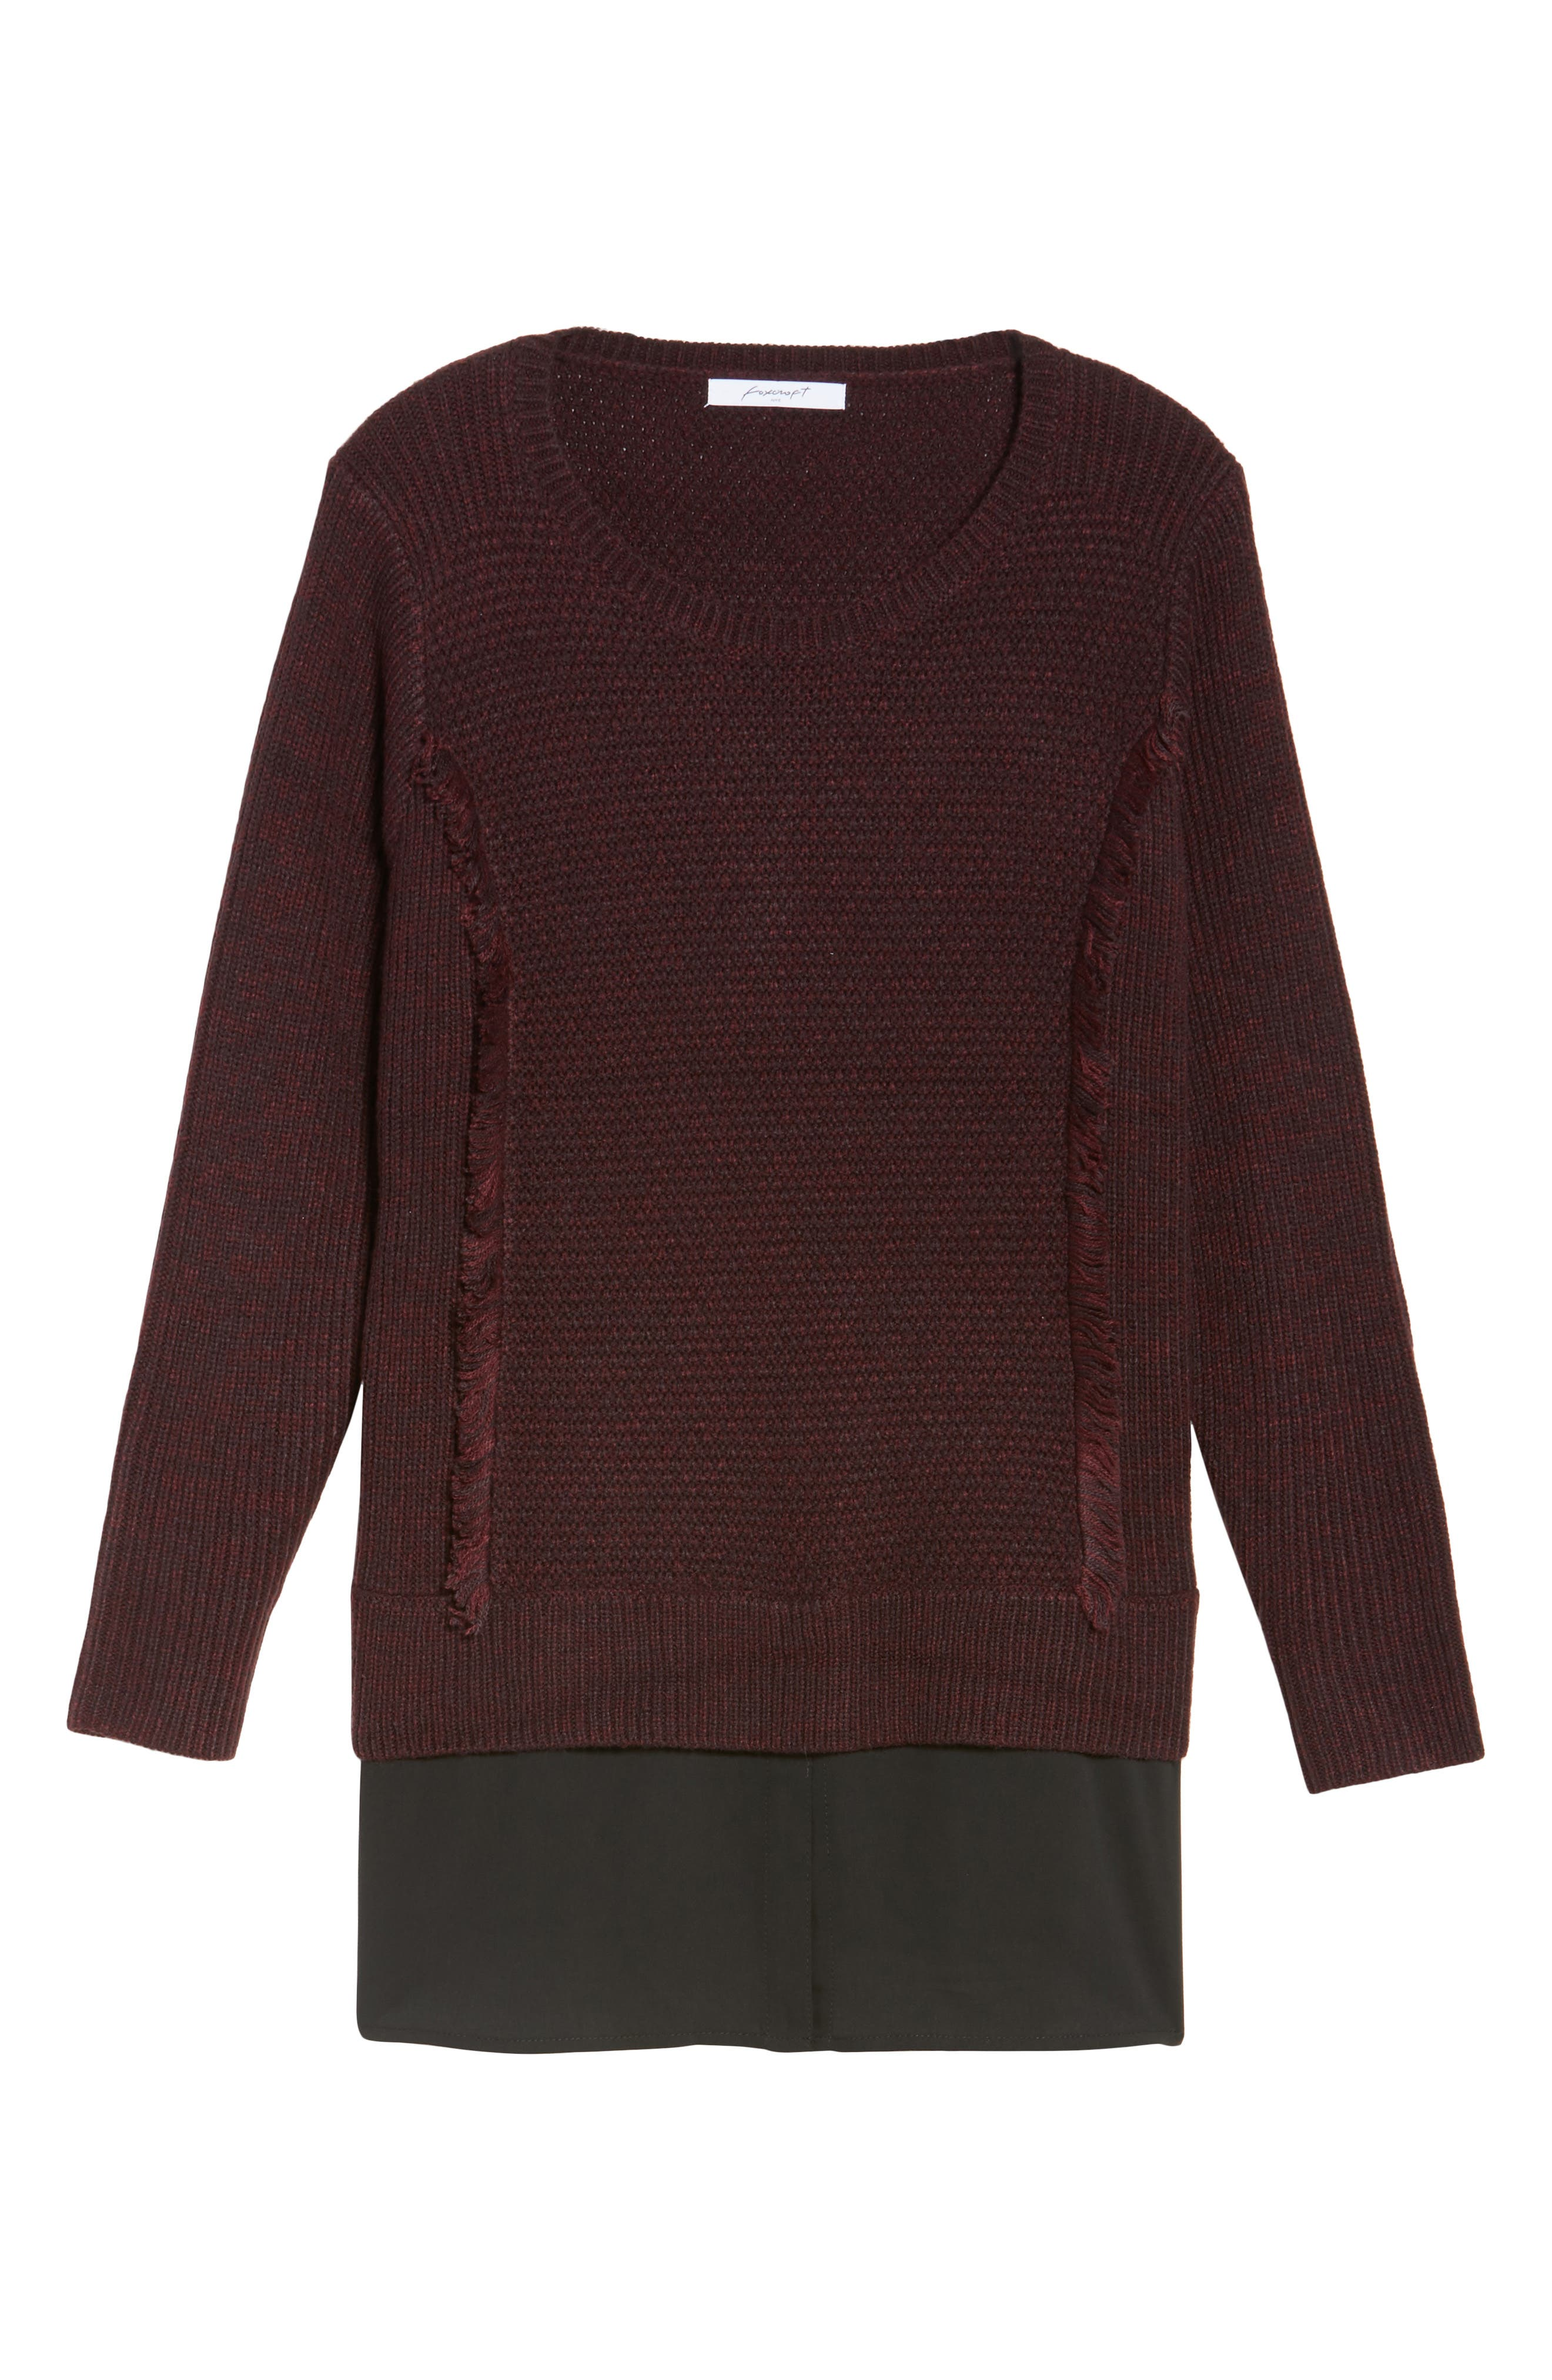 Sophia Layered Look Sweater,                             Alternate thumbnail 6, color,                             606